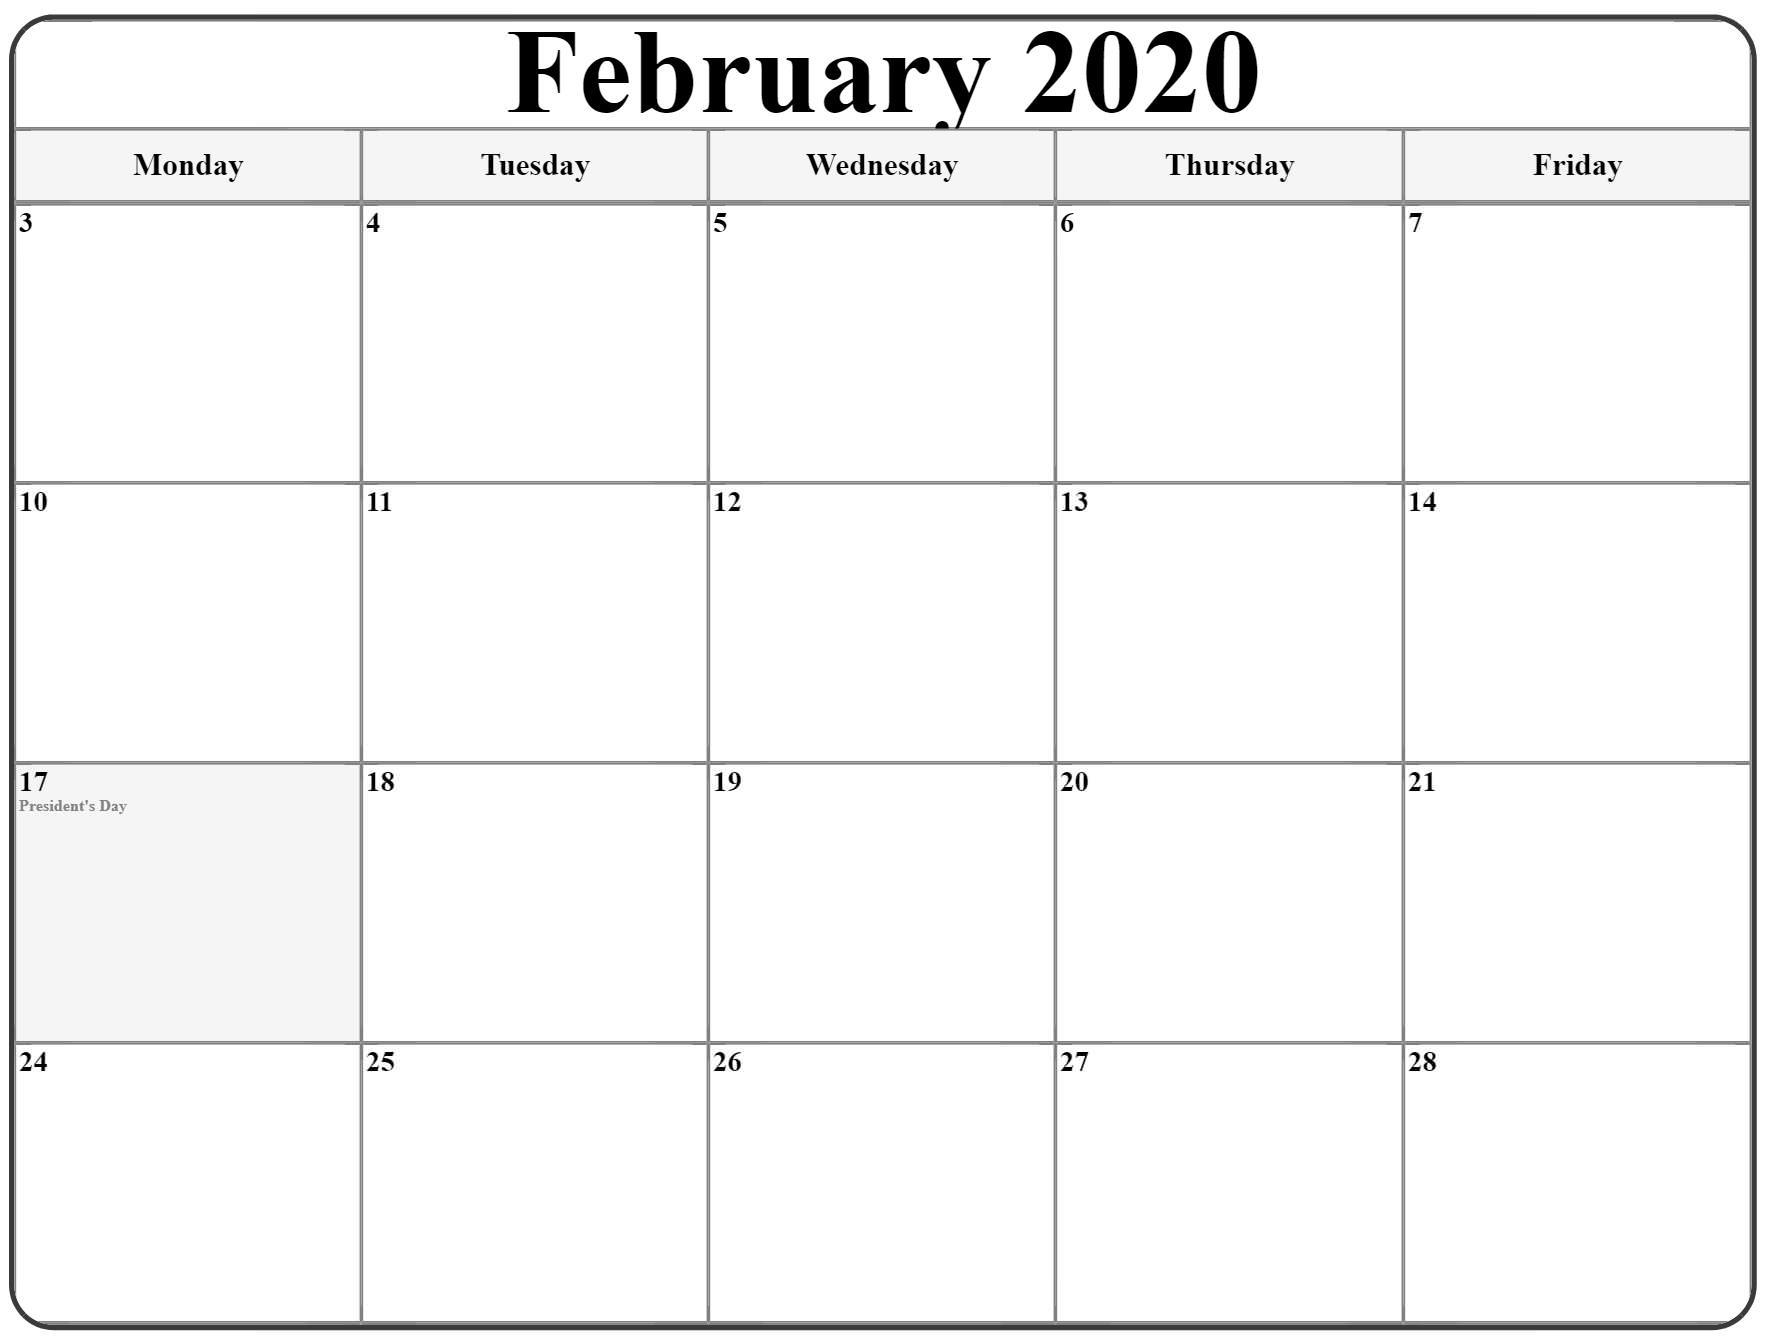 February 2020 Monday Calendar | Monday To Sunday in Monday To Friday Calendar